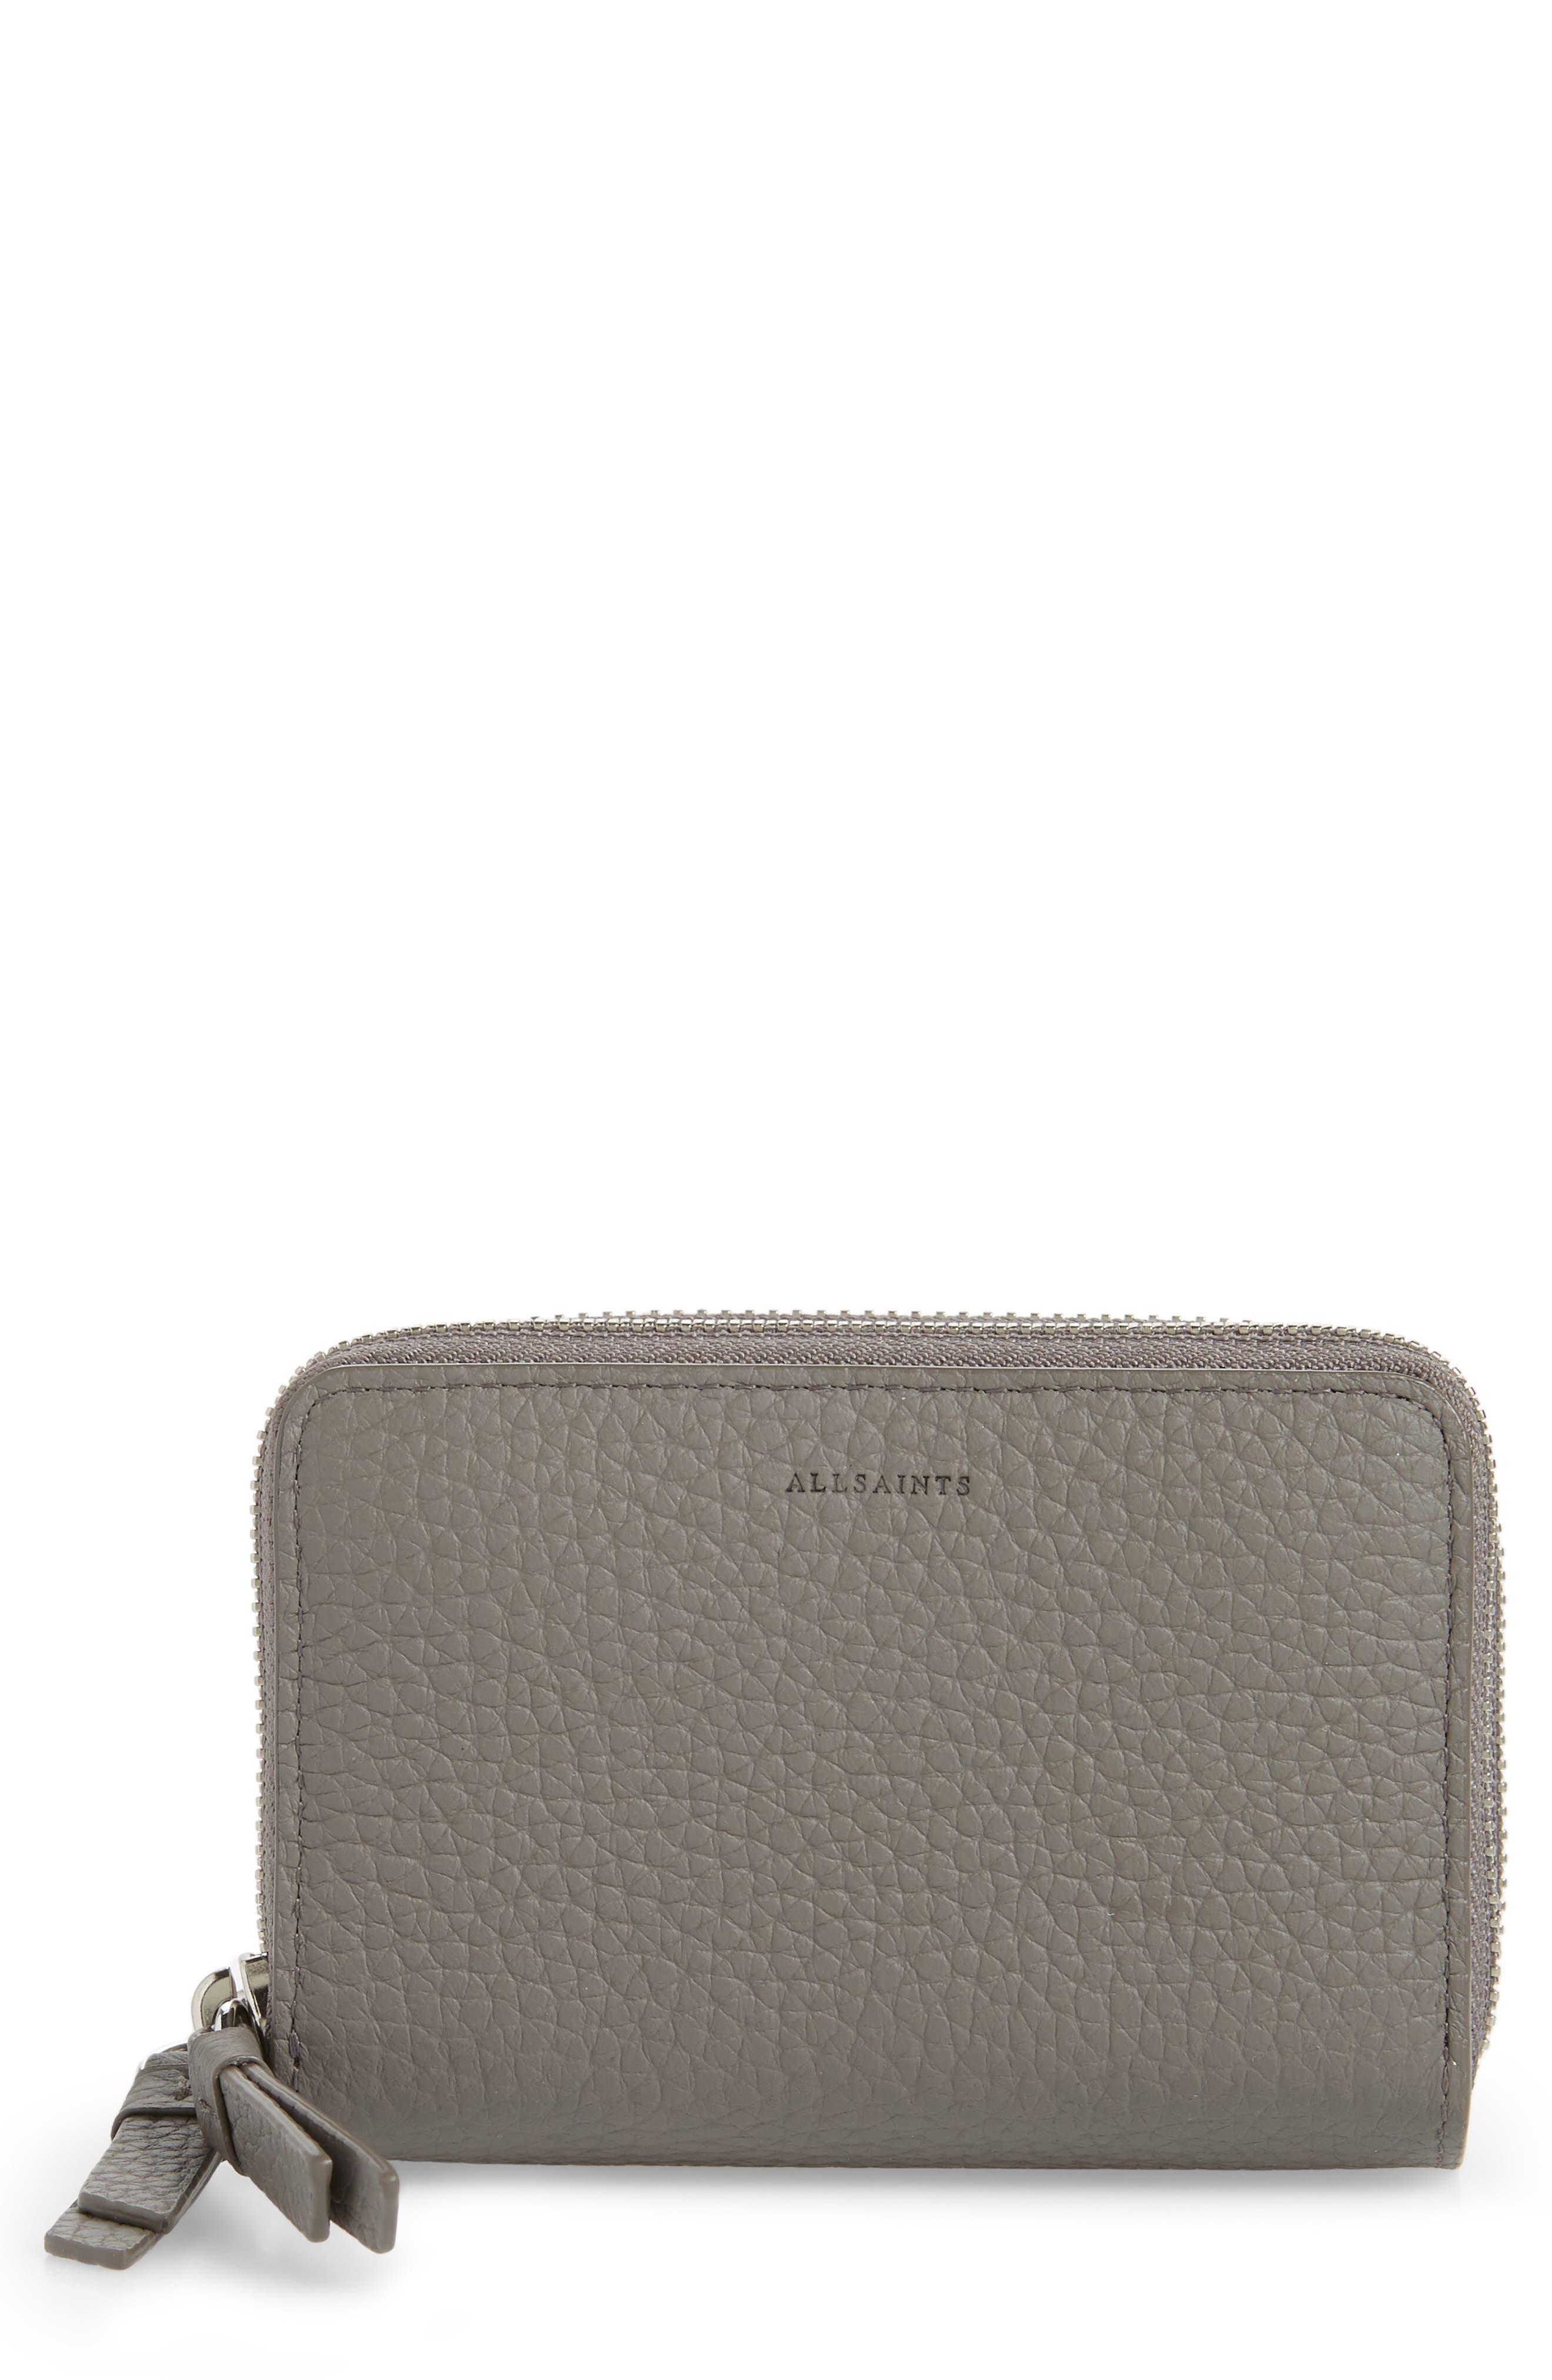 Image of ALLSAINTS Fetch Leather Card Holder